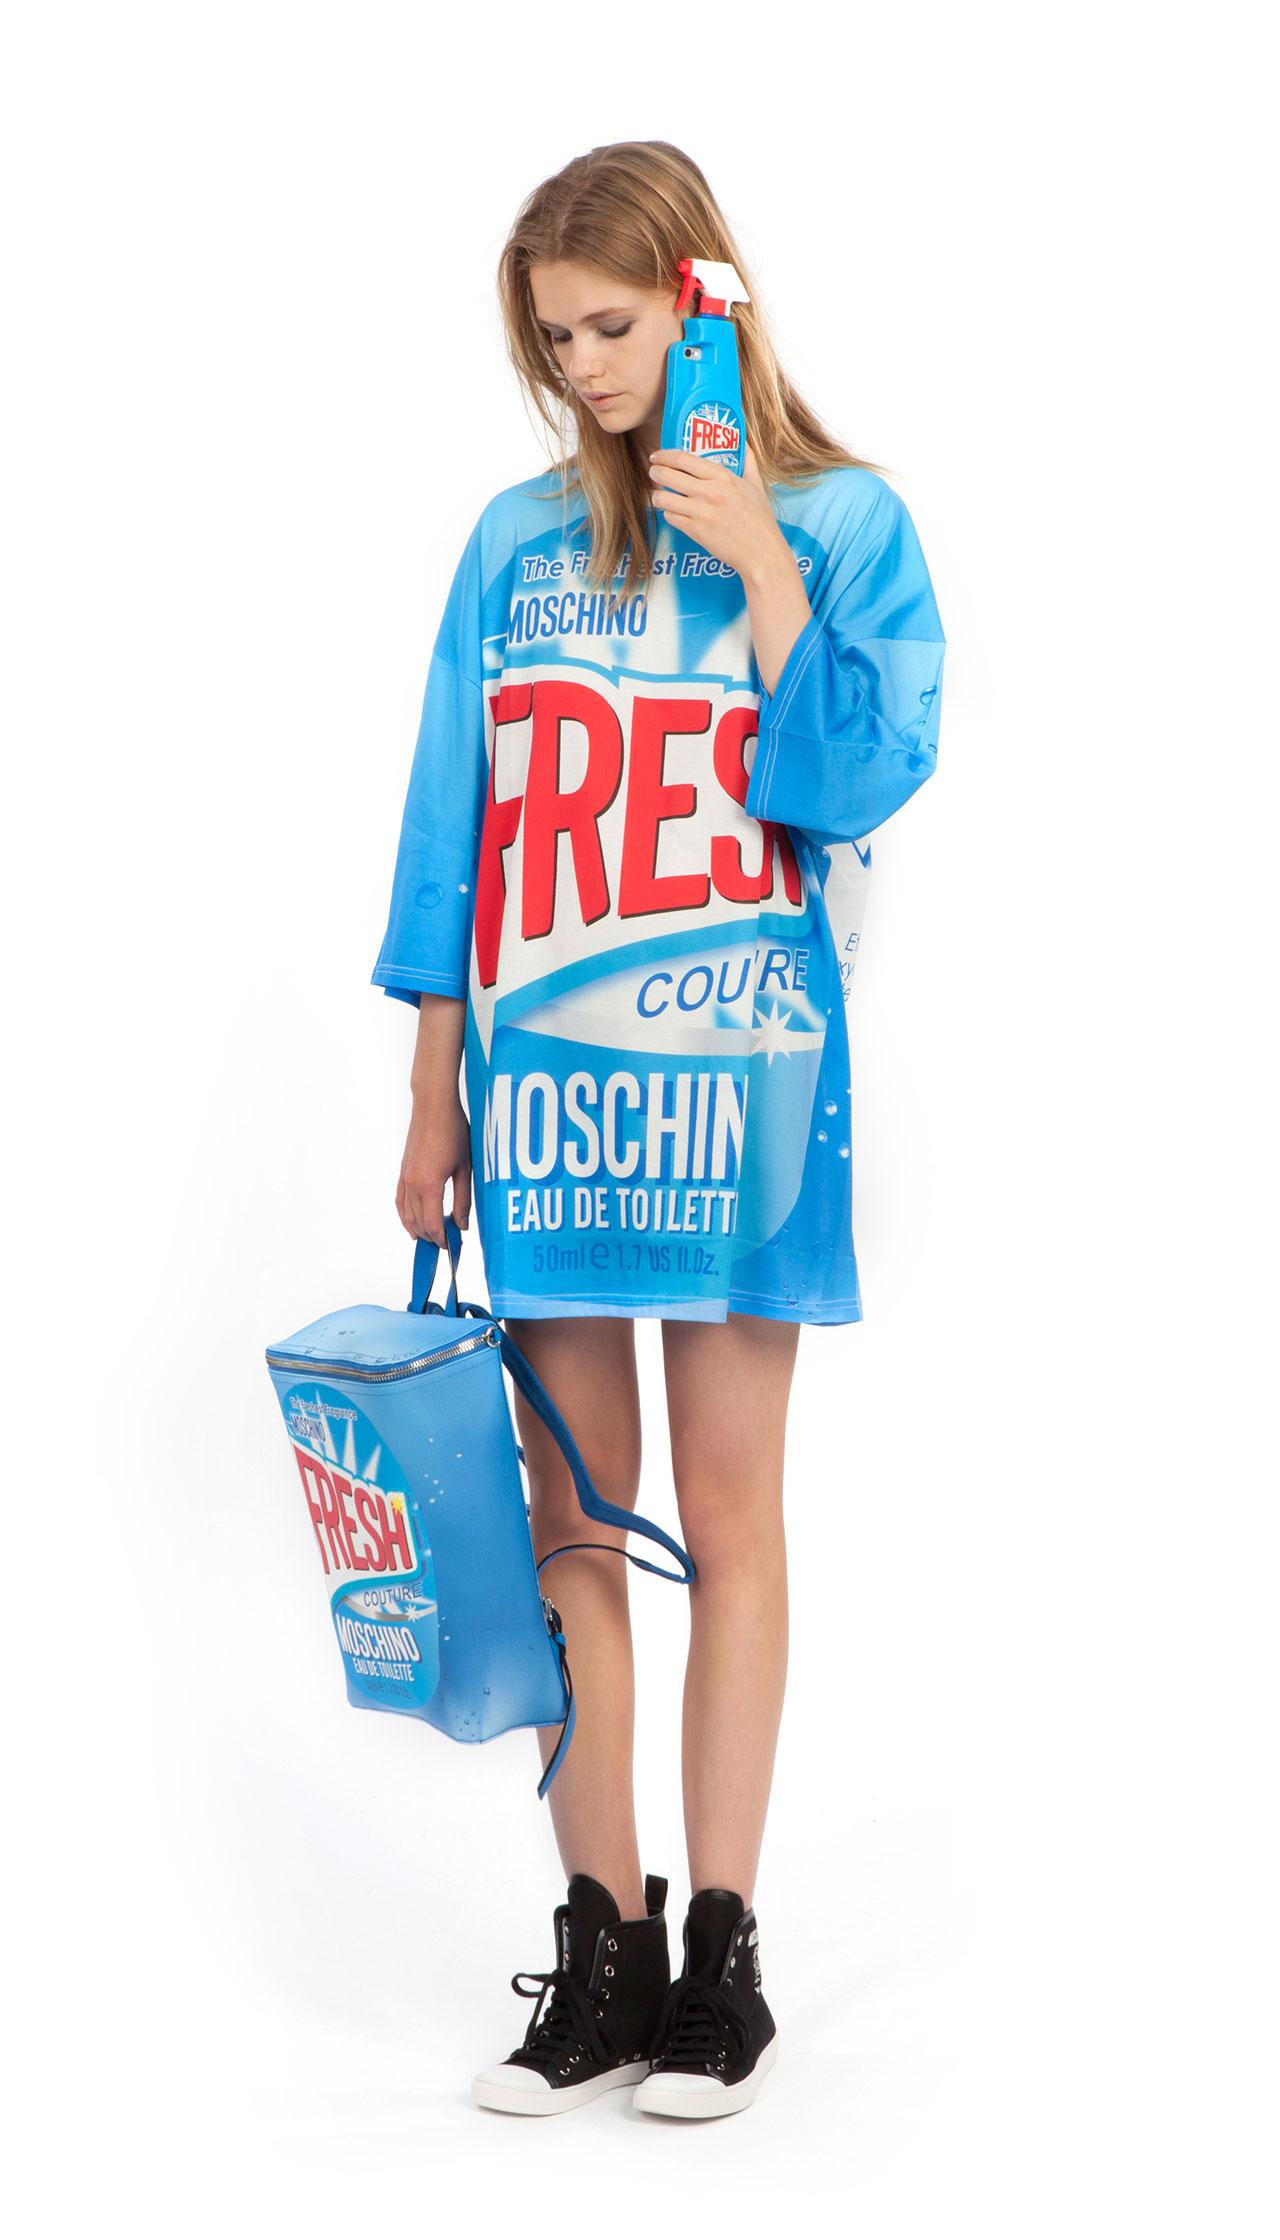 Moschino Fresh Couture Eau de Toilette: So Meta ...